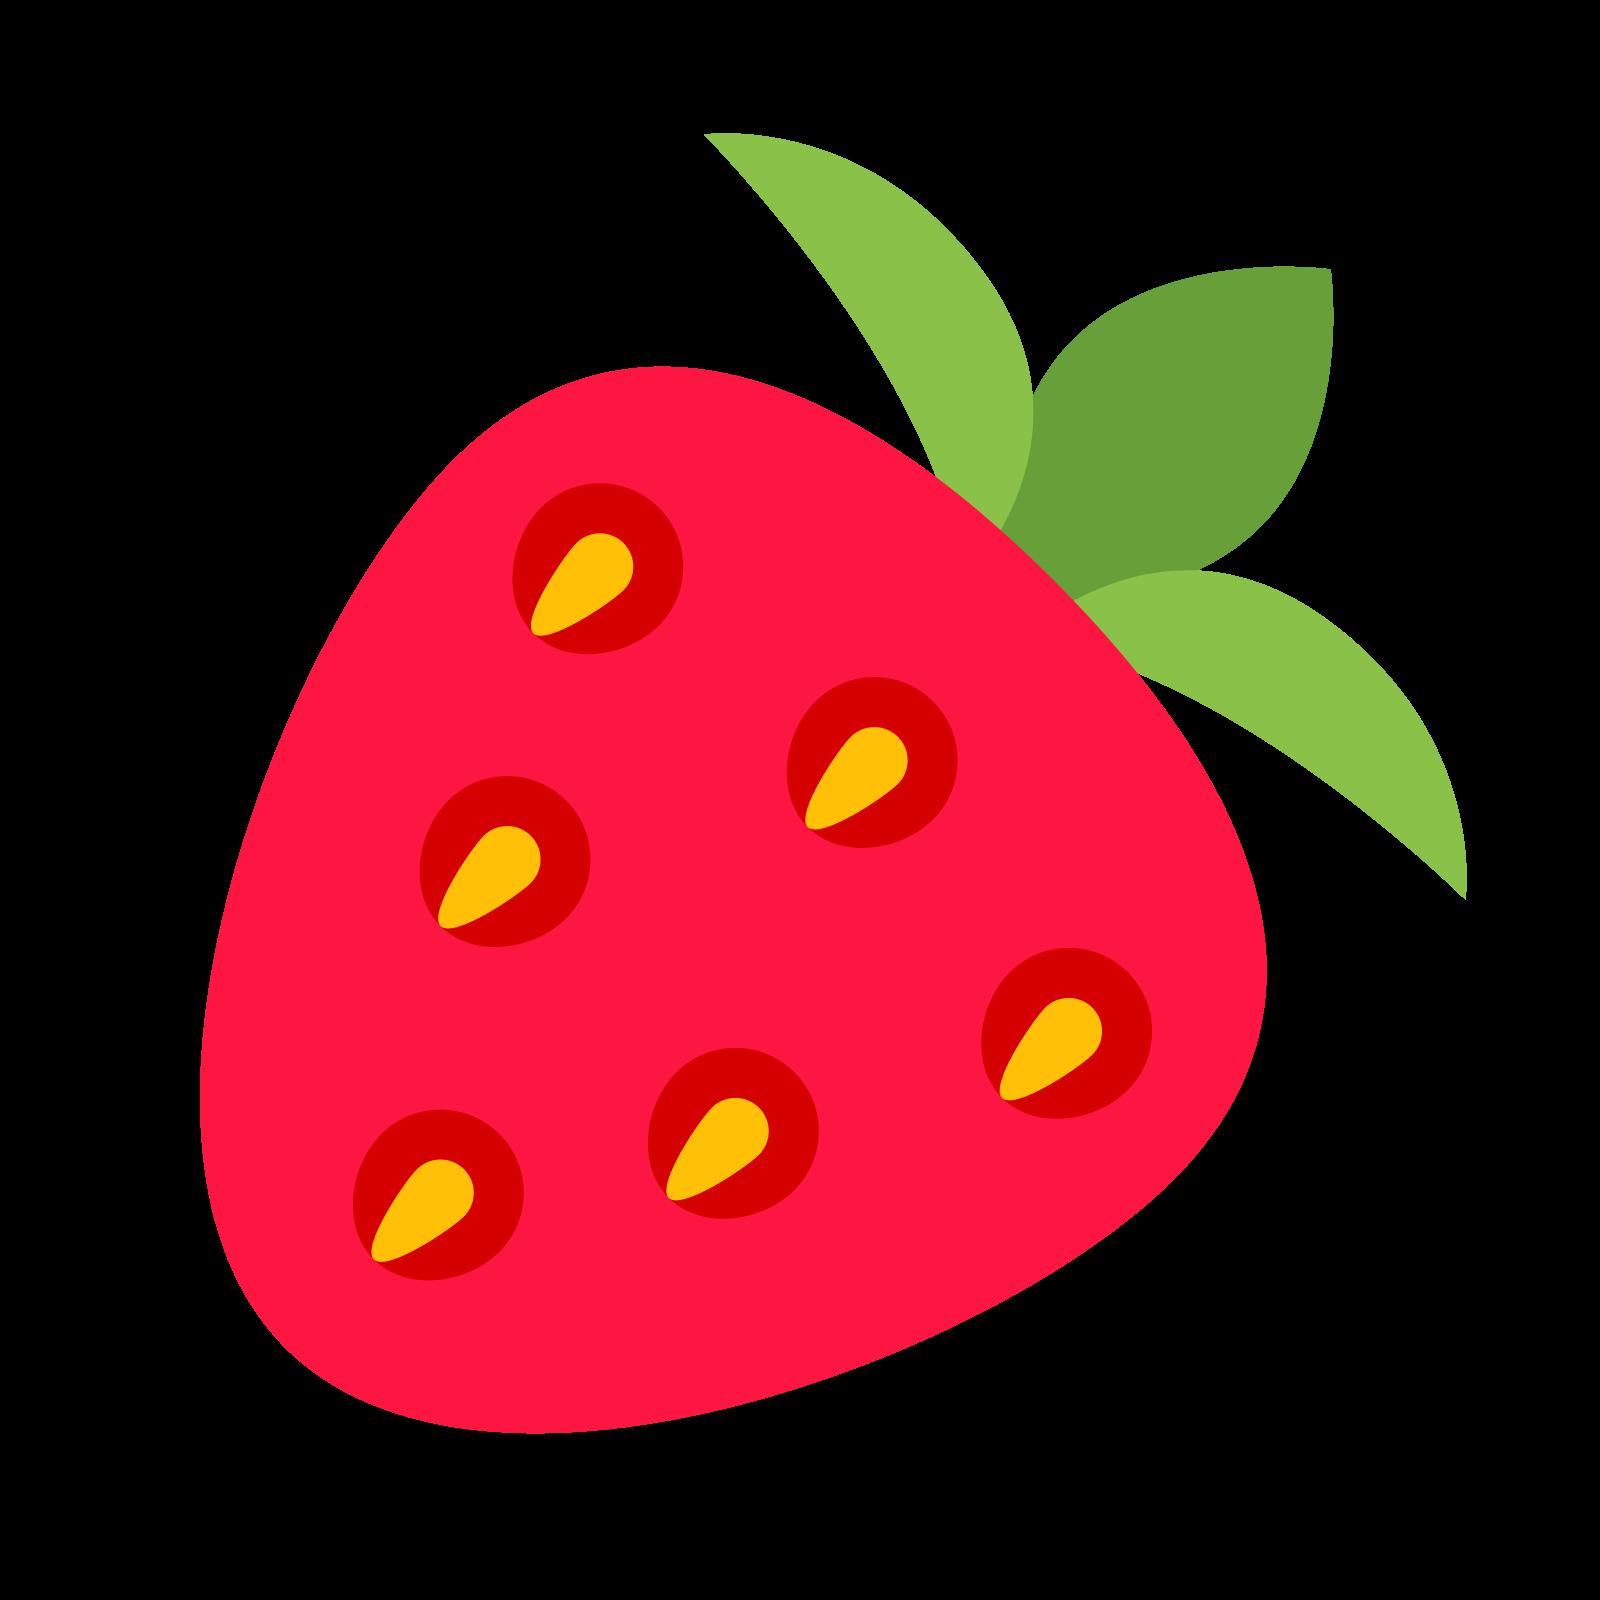 clip freeuse stock Milkshake Strawberry Computer Icons Food